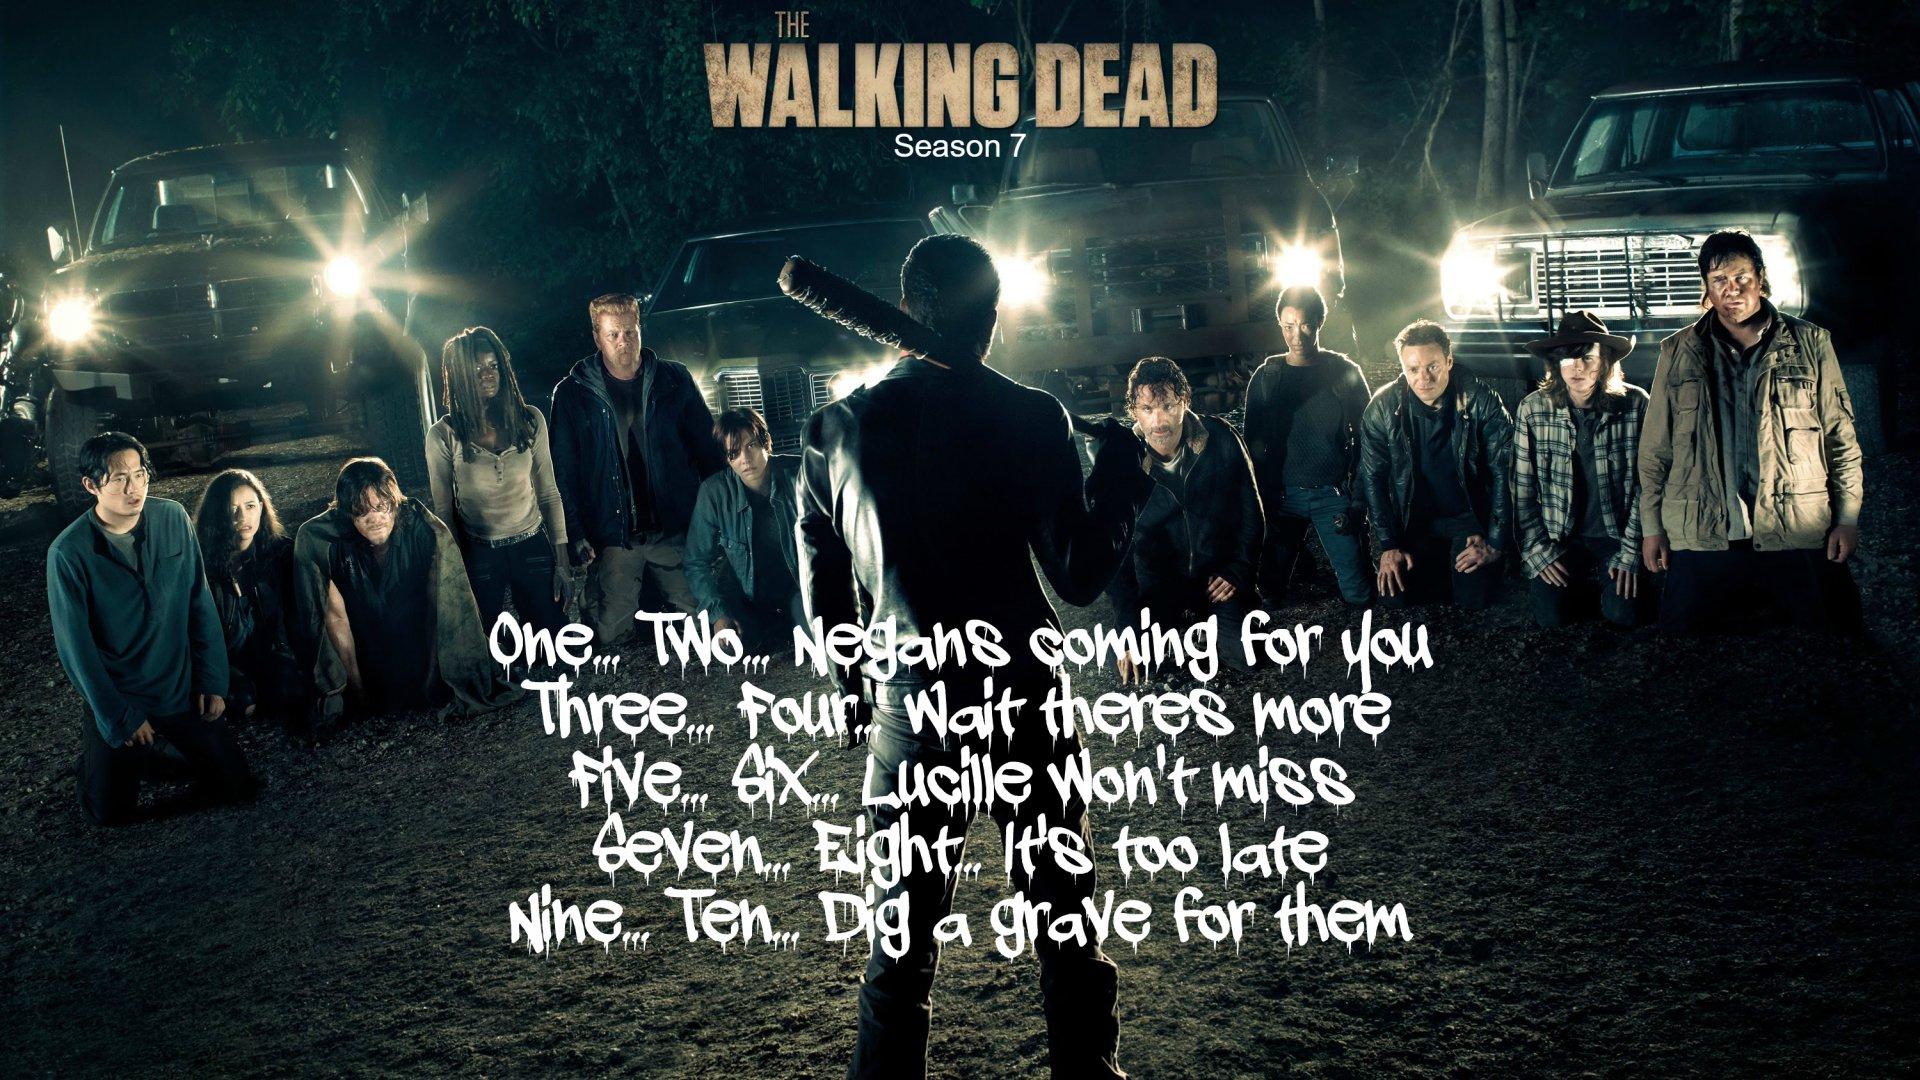 The Walking Dead Negan Wallpaper: Negan's Decision HD Wallpaper